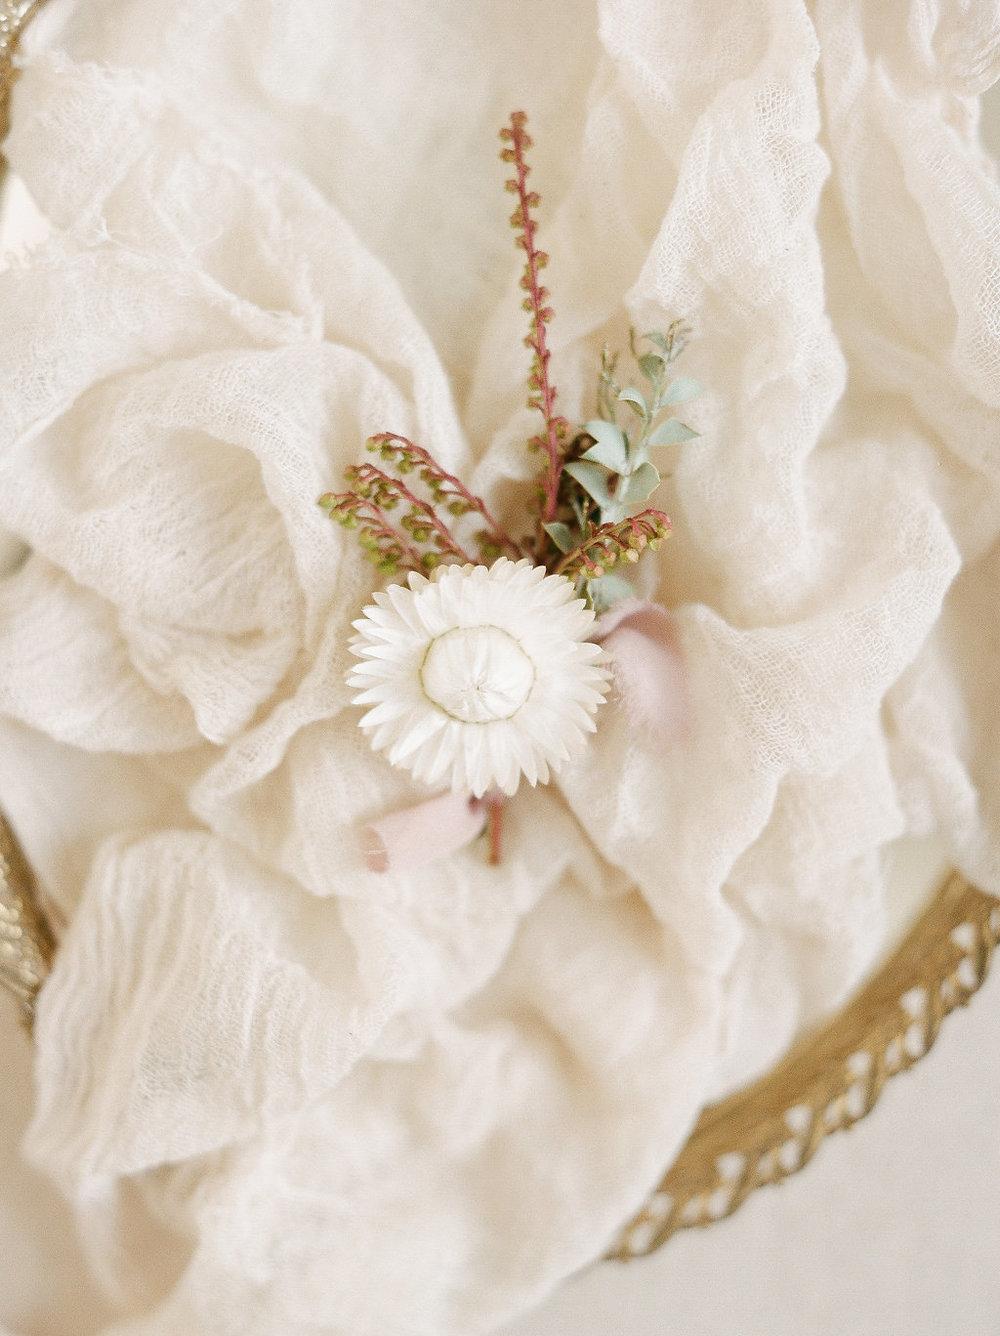 Spanish Mission Style Wedding Ideas Boutonniere Summer Flowers Finding Flora San Juan Capistrano European Venues California